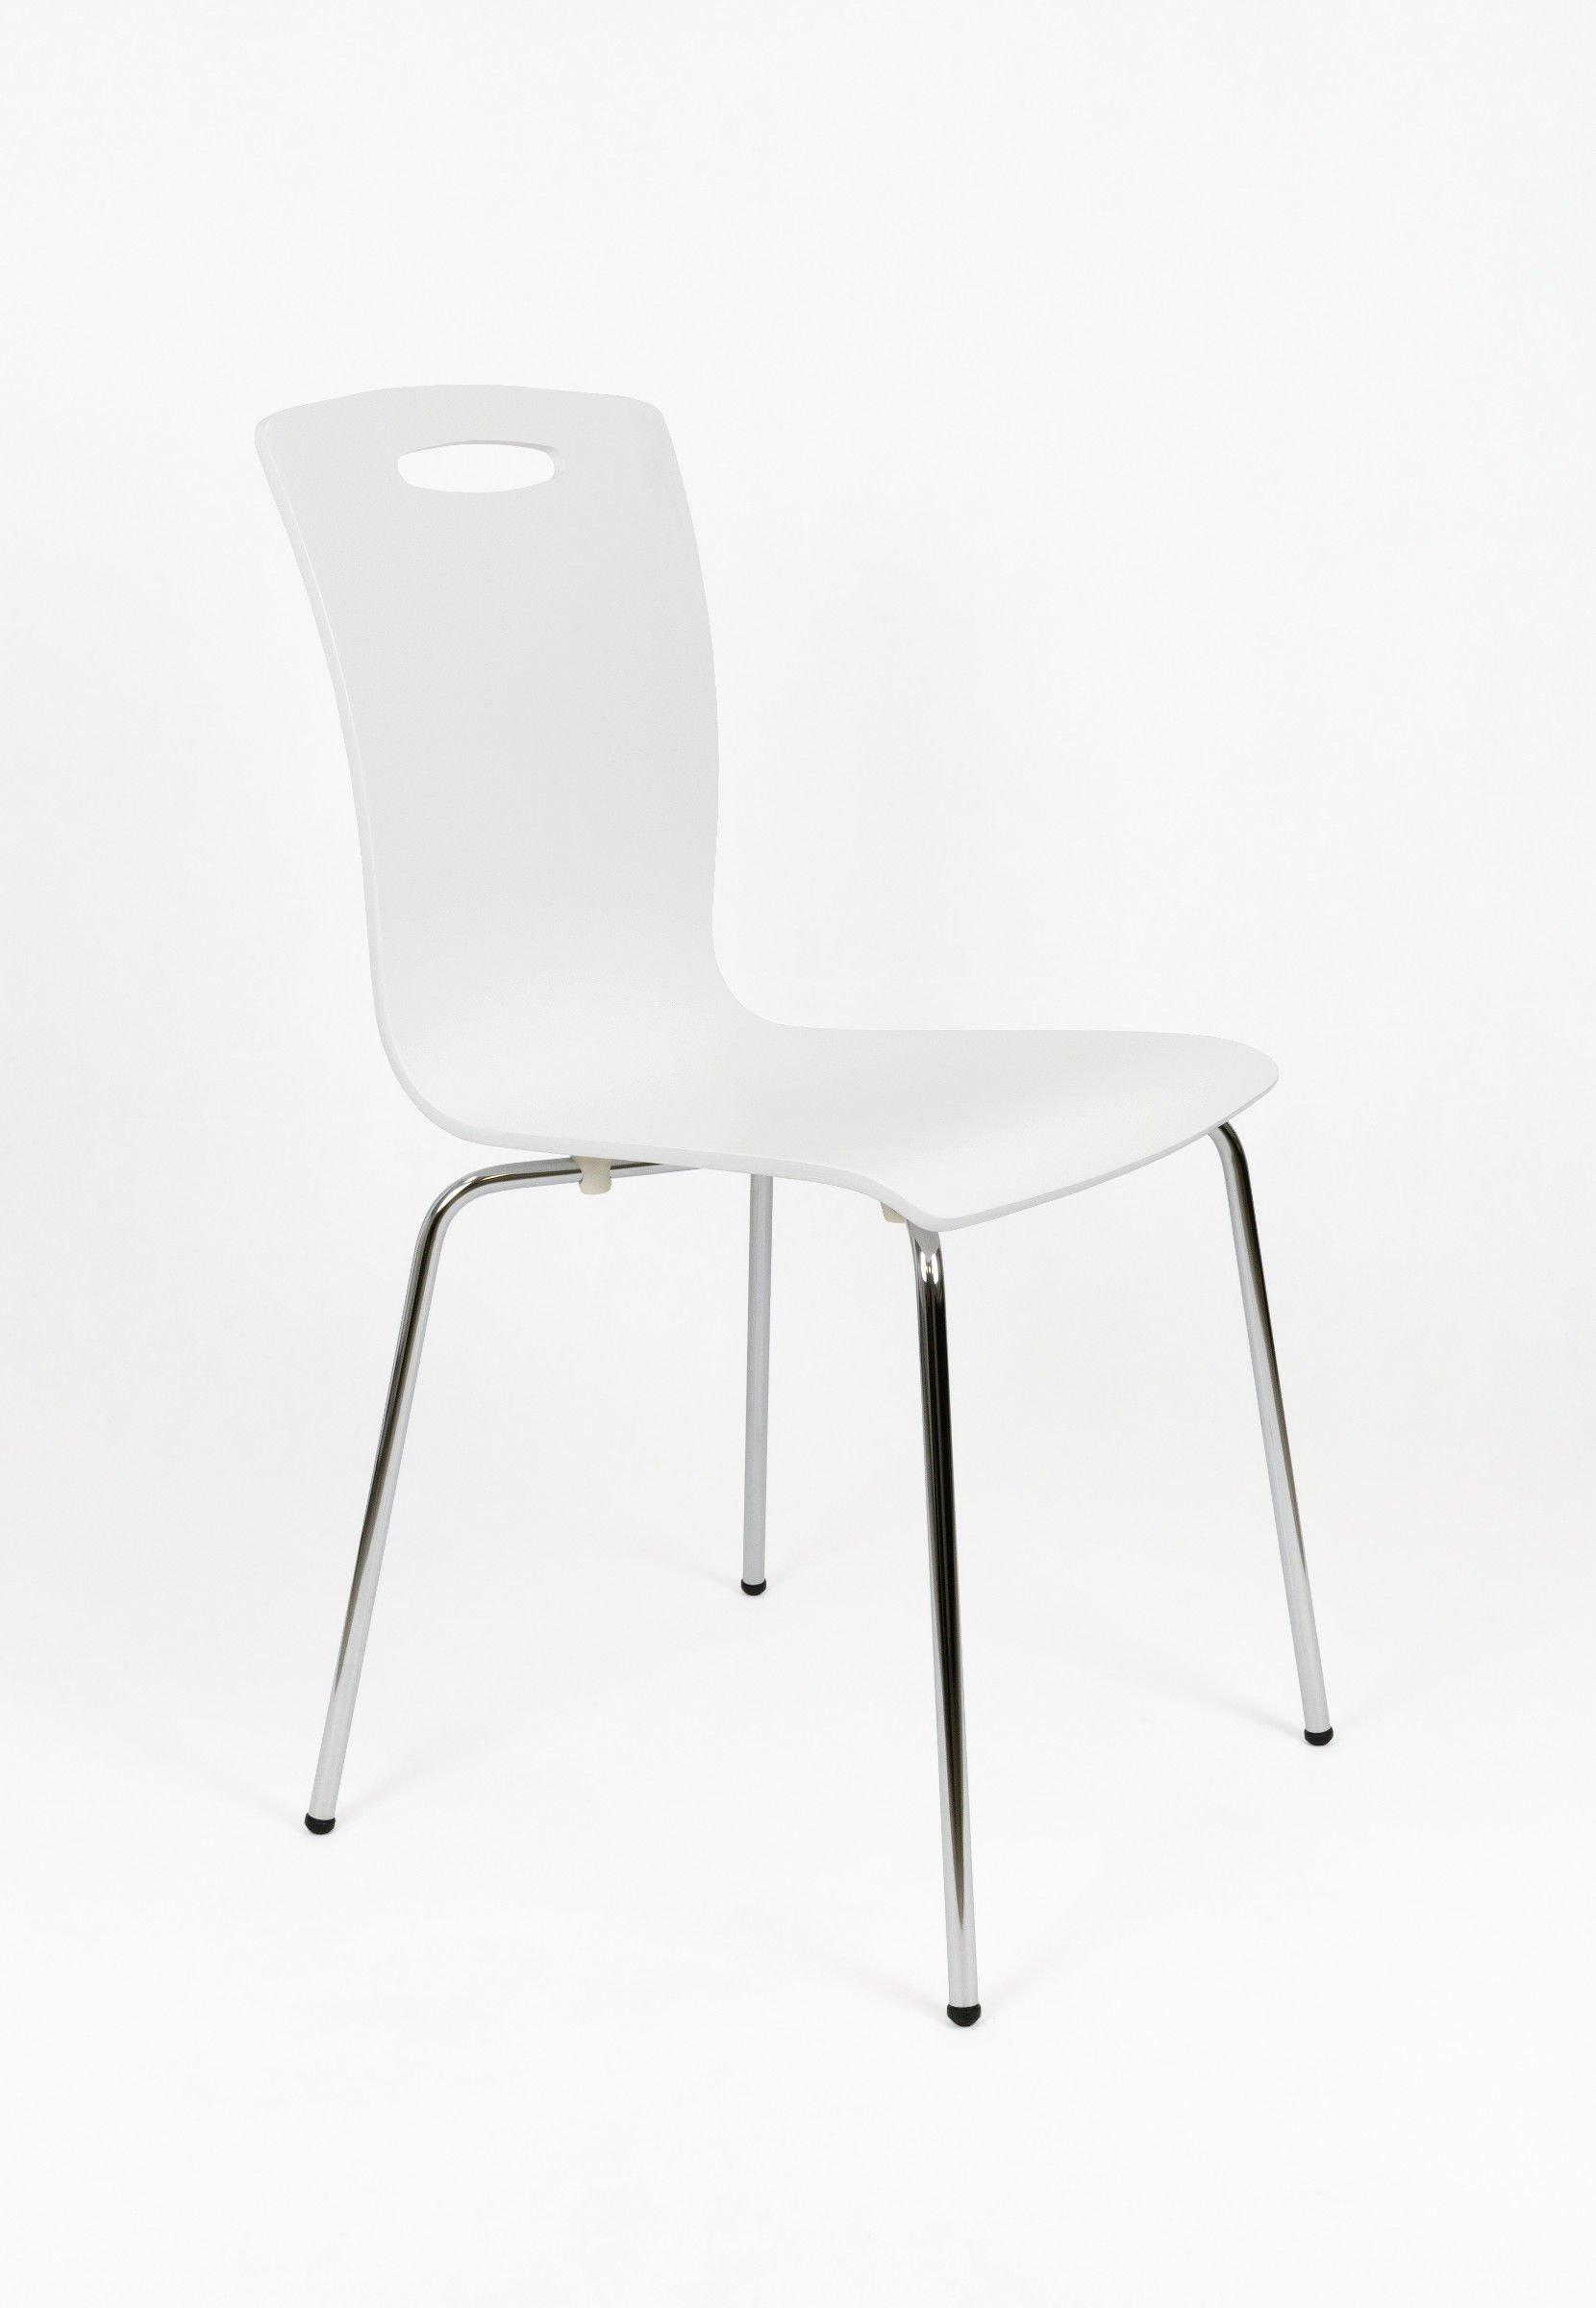 sk design skd002 stuhl weiss holz weiss angebot st hlen salon esszimmer k che krzes a. Black Bedroom Furniture Sets. Home Design Ideas